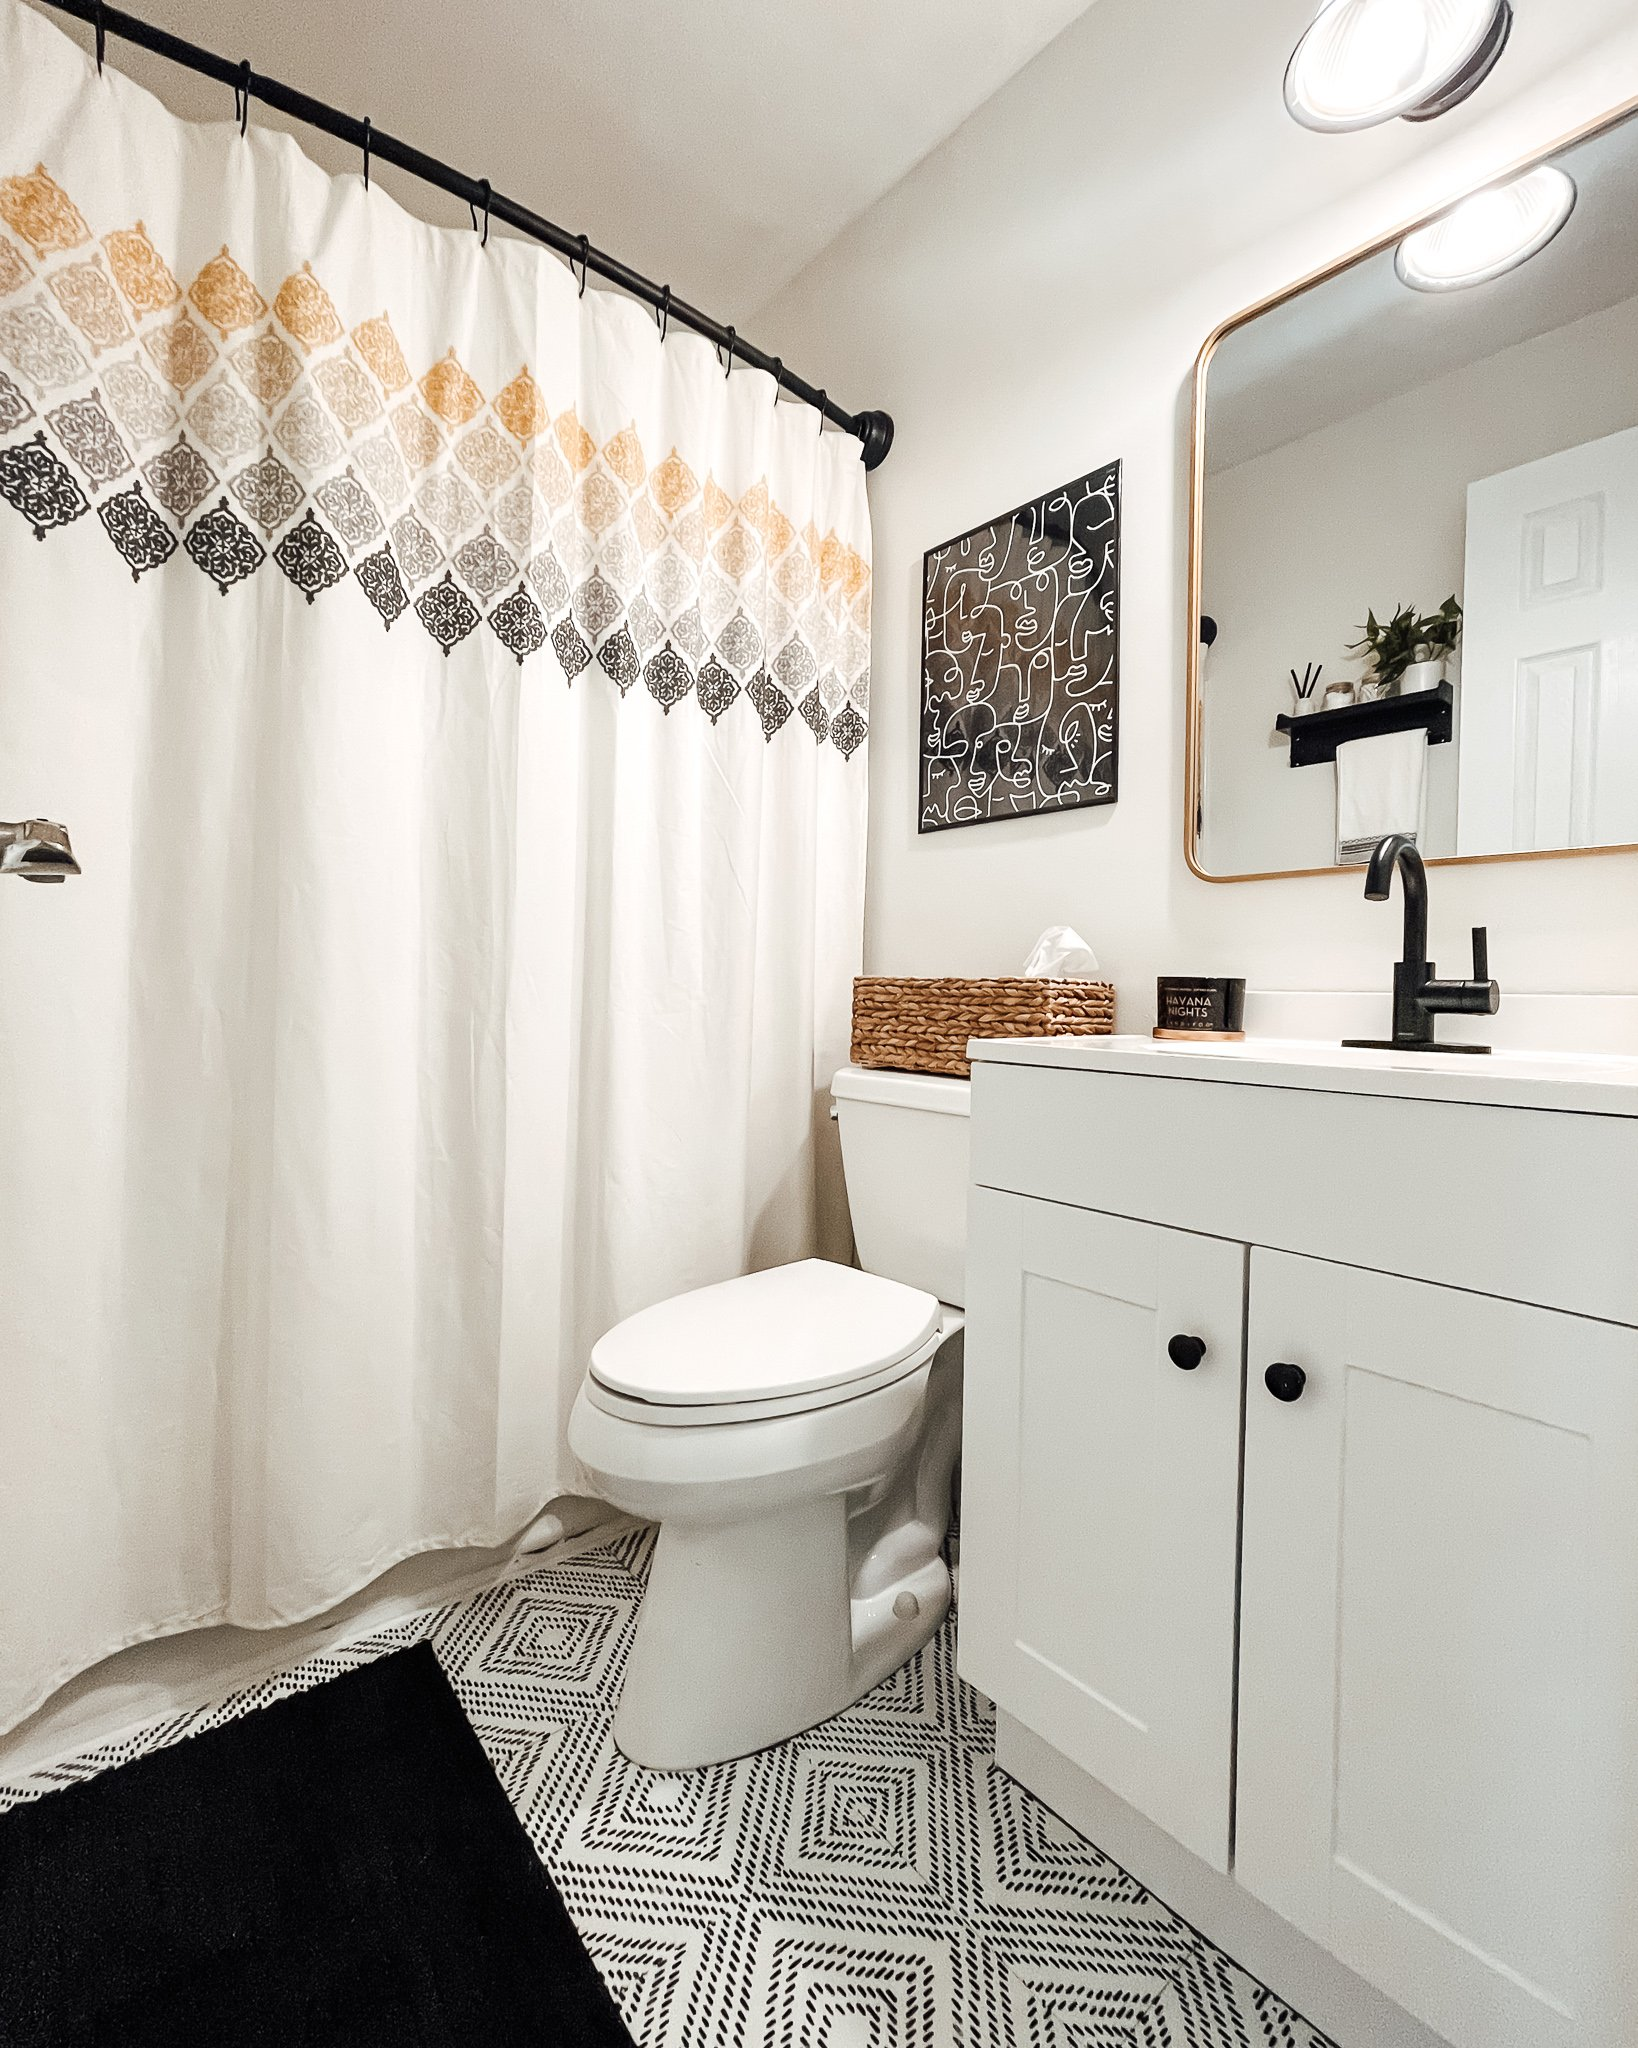 The Kola Home Indiana Bathroom Transformation 3 | Ijeoma Kola